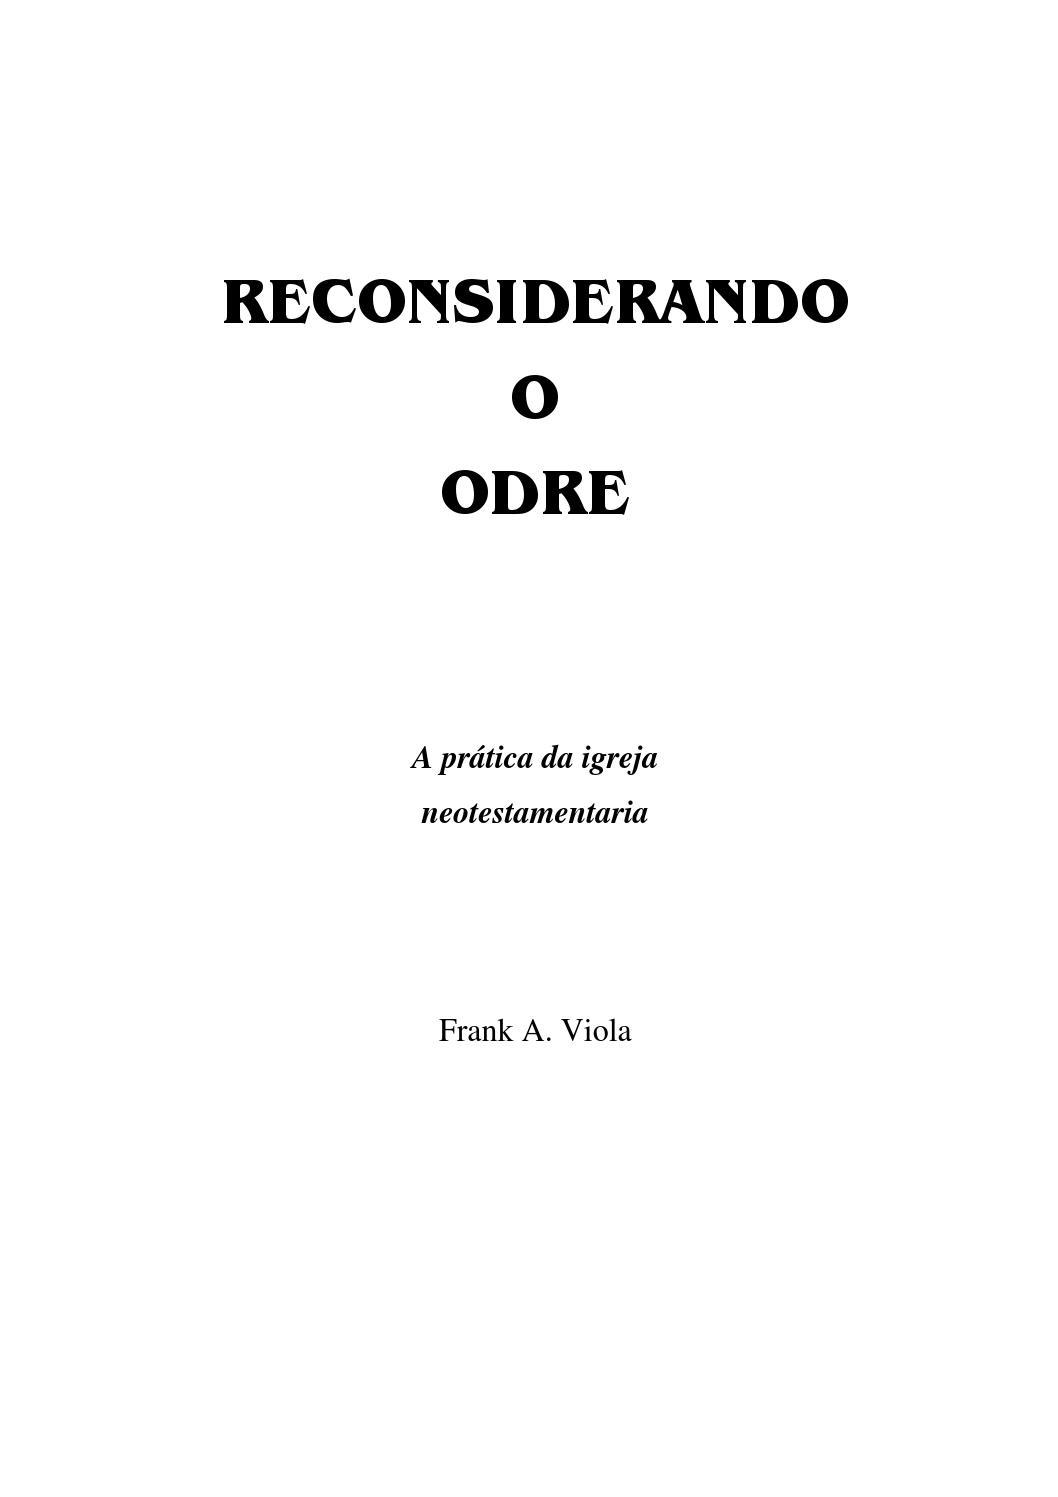 Reconsiderando o odre frank viola by marcelo simes issuu ccuart Choice Image